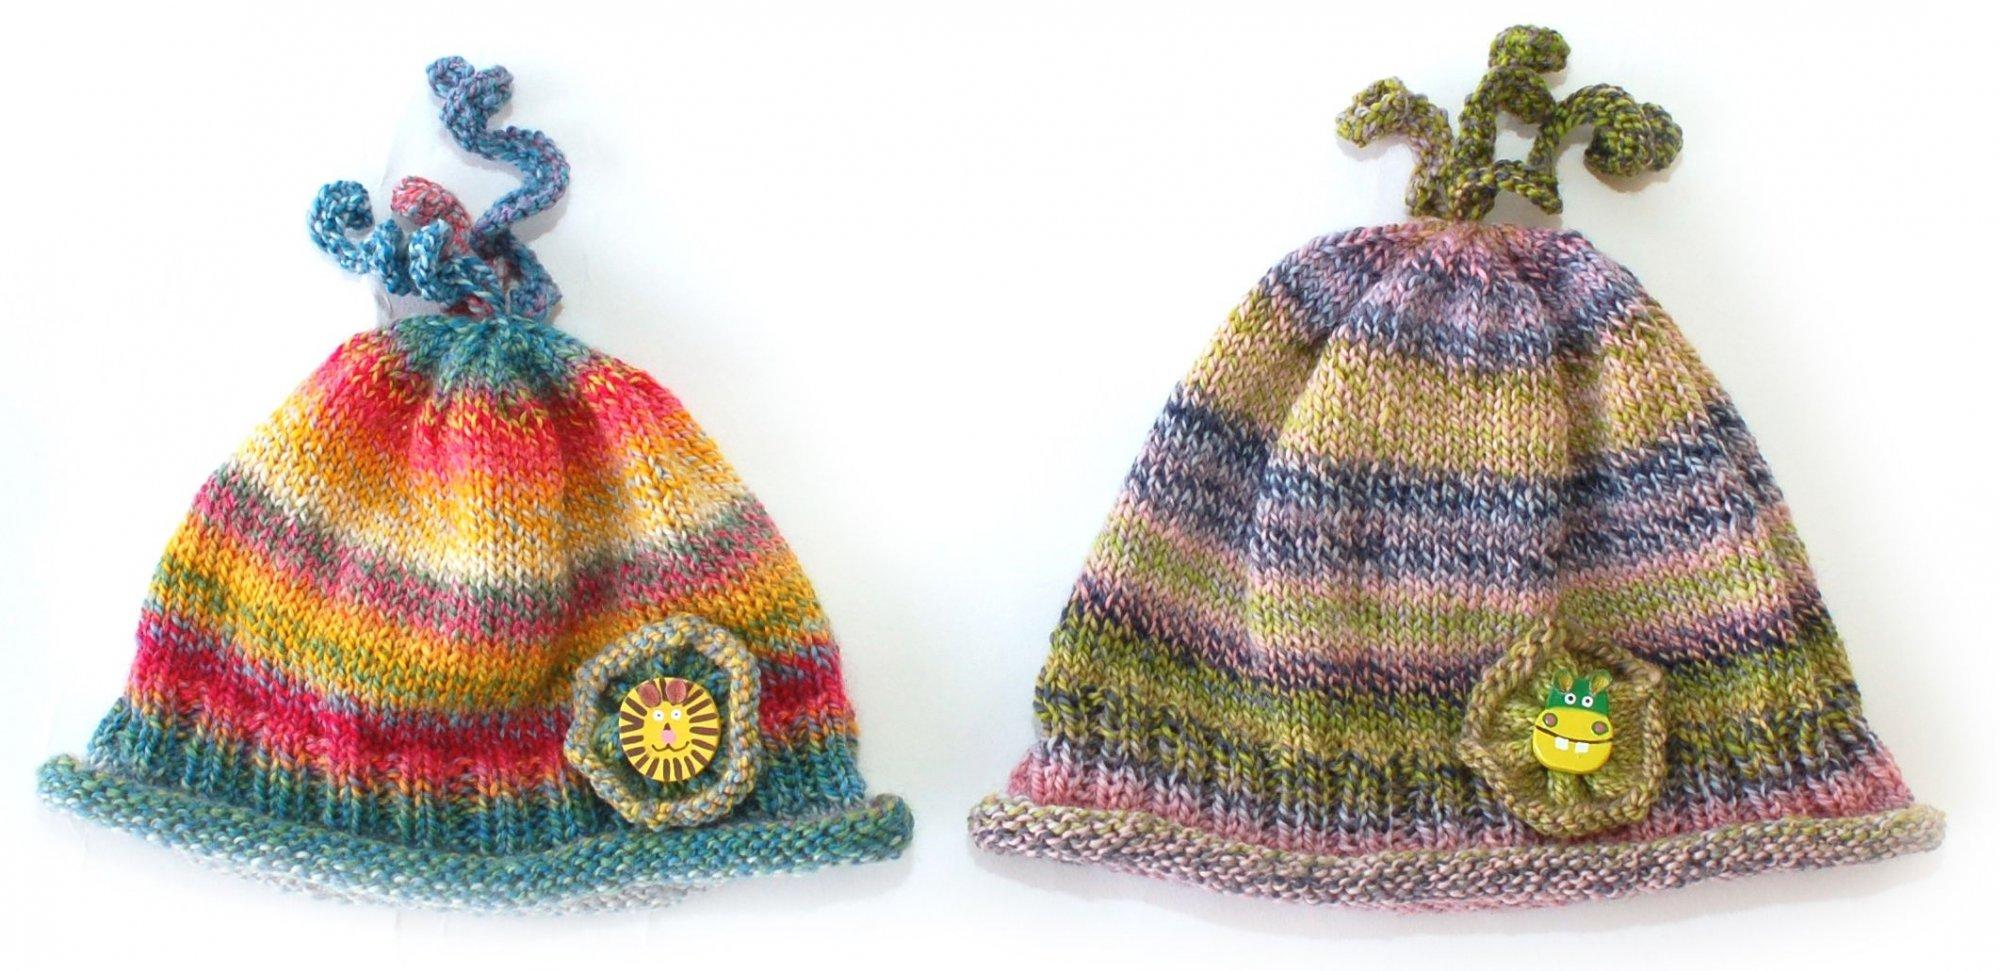 Corkscrew Baby Hat Kit